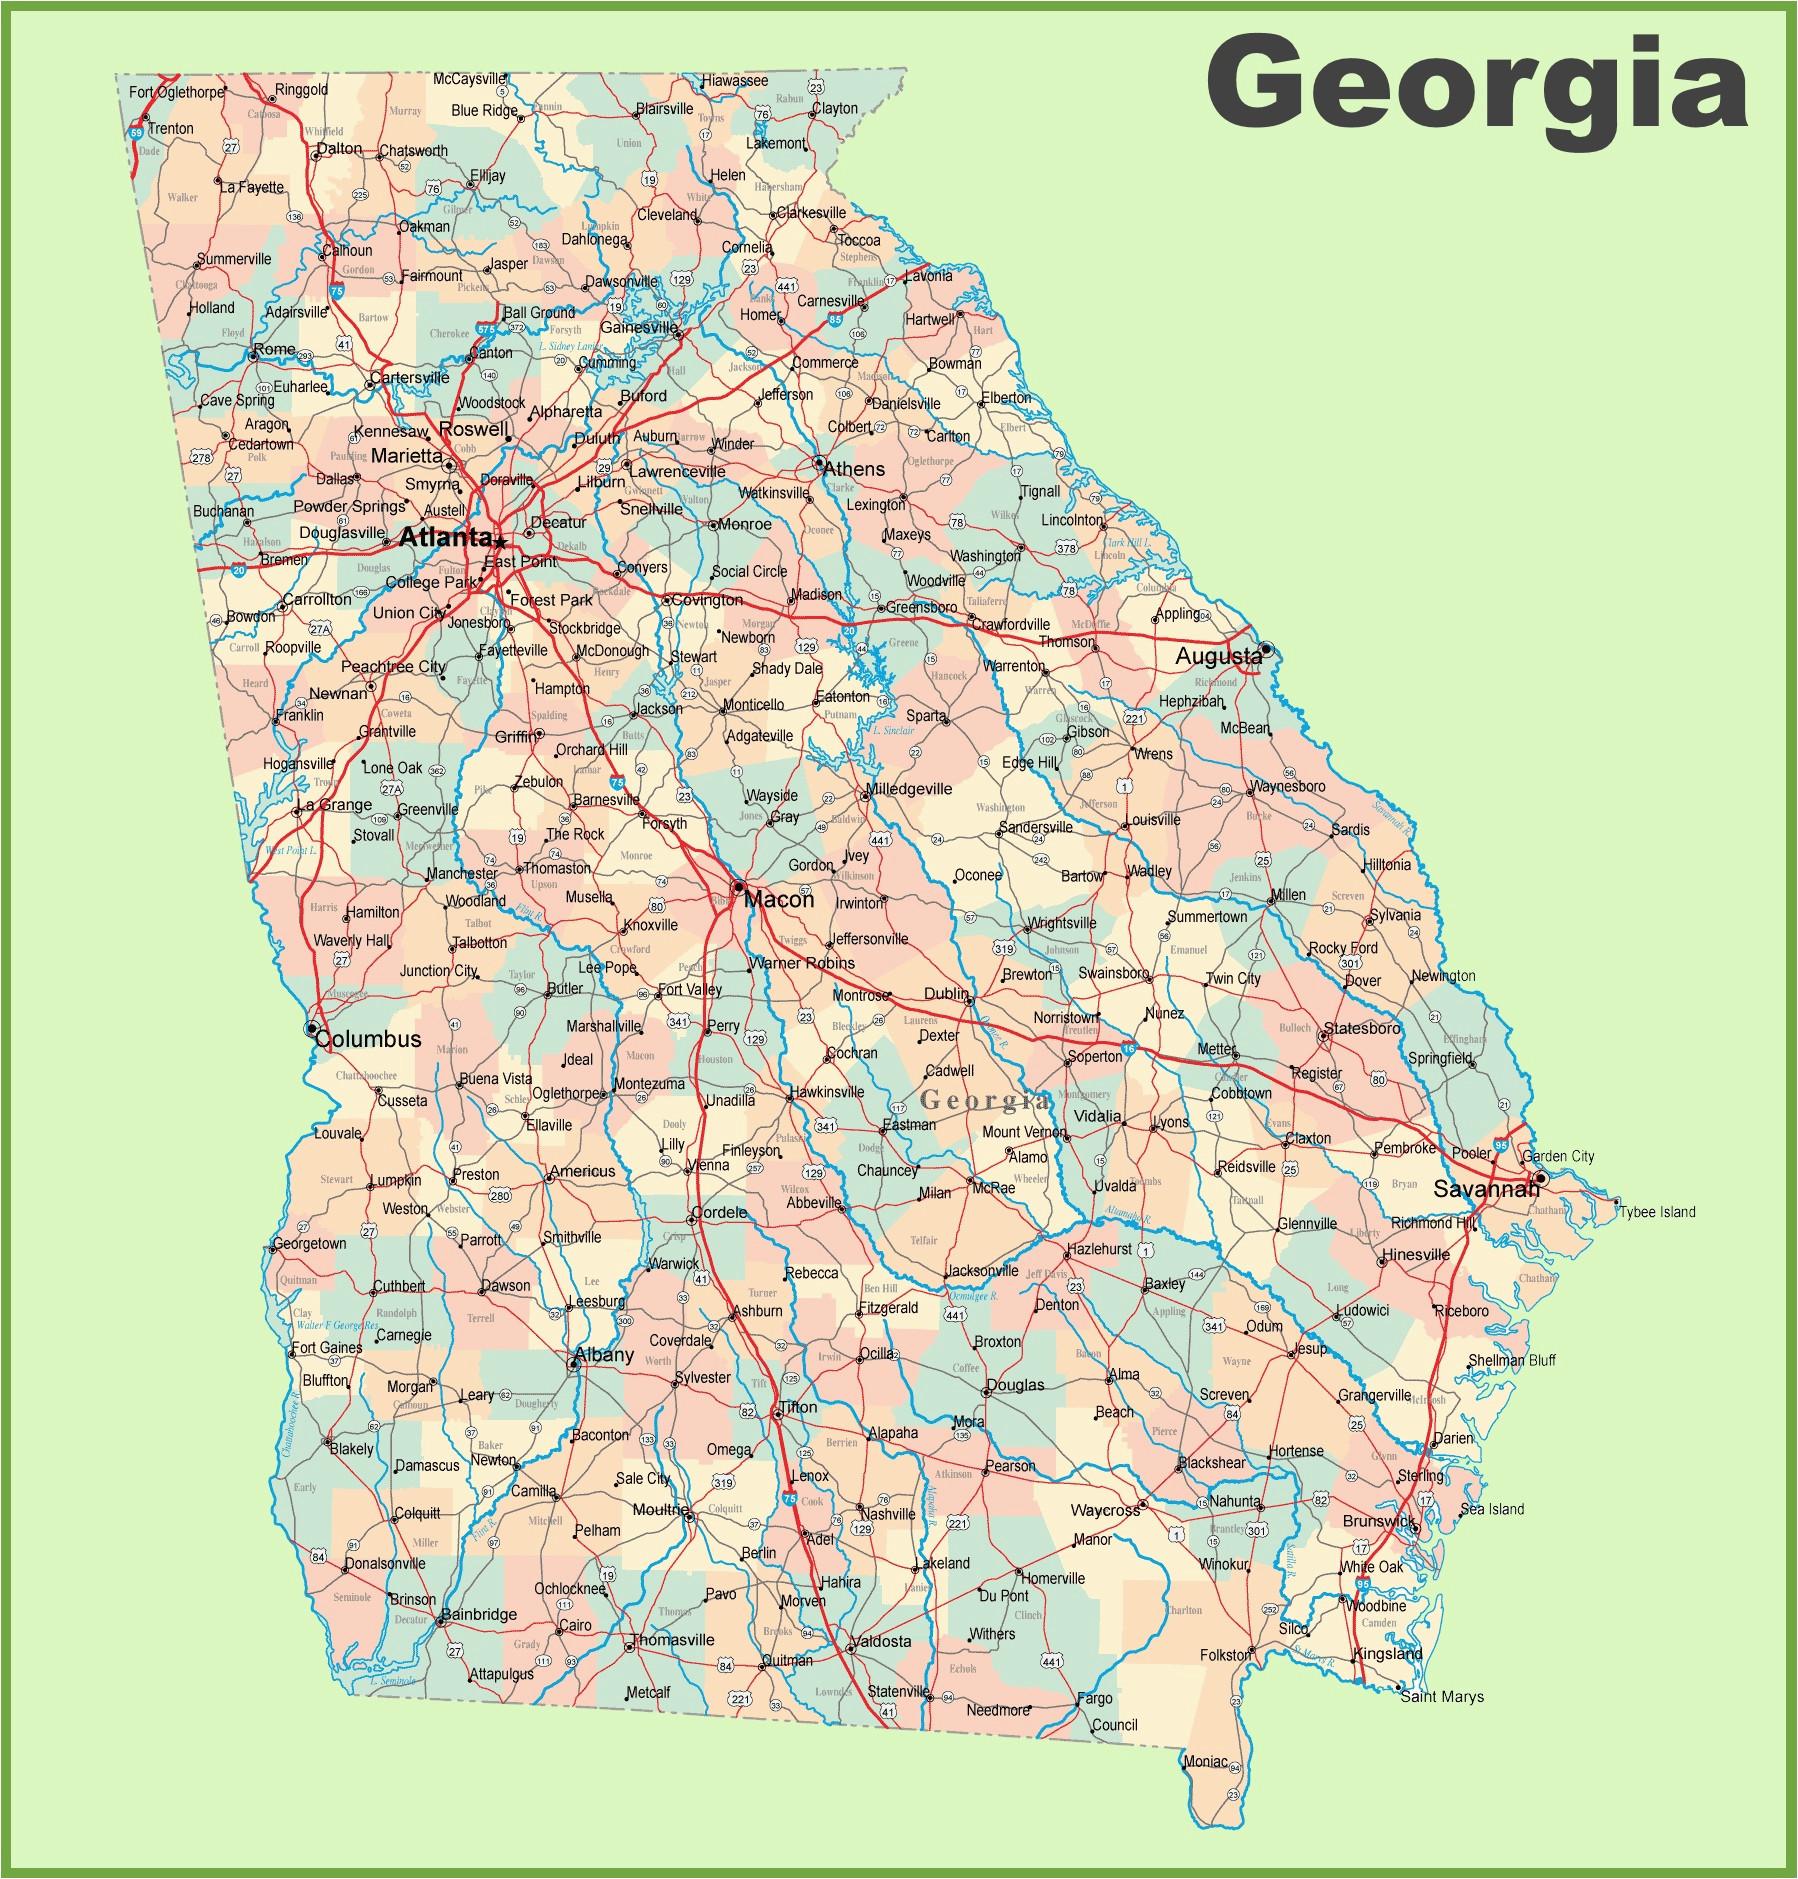 Map Of Georgia Coastal Towns.Map Of Georgia Coastal Cities Georgia Road Map With Cities And Towns